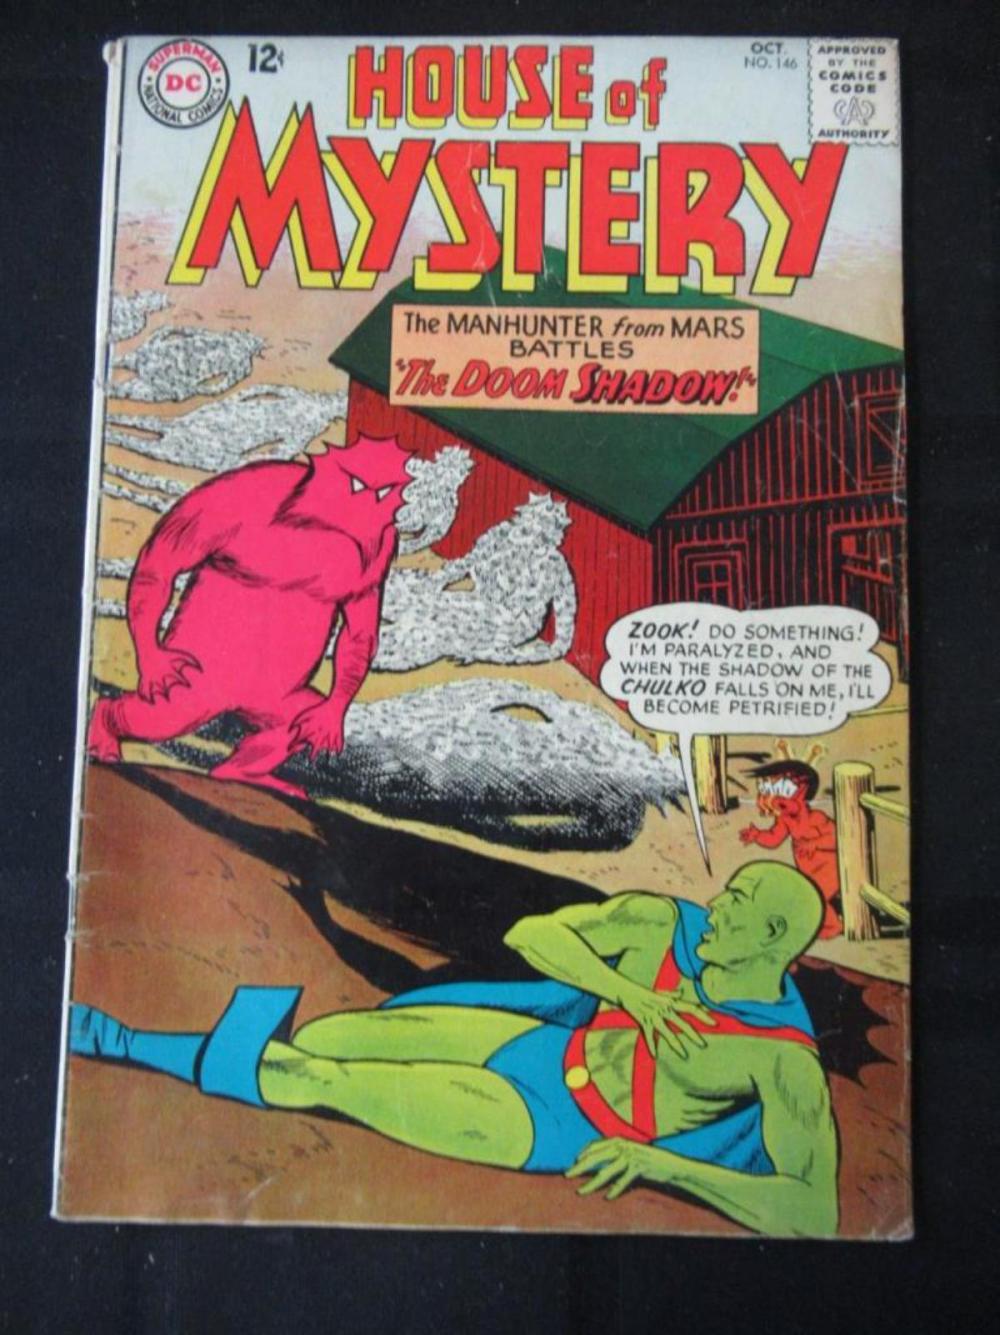 House of Mystery 12c #146 The Doom Shadow